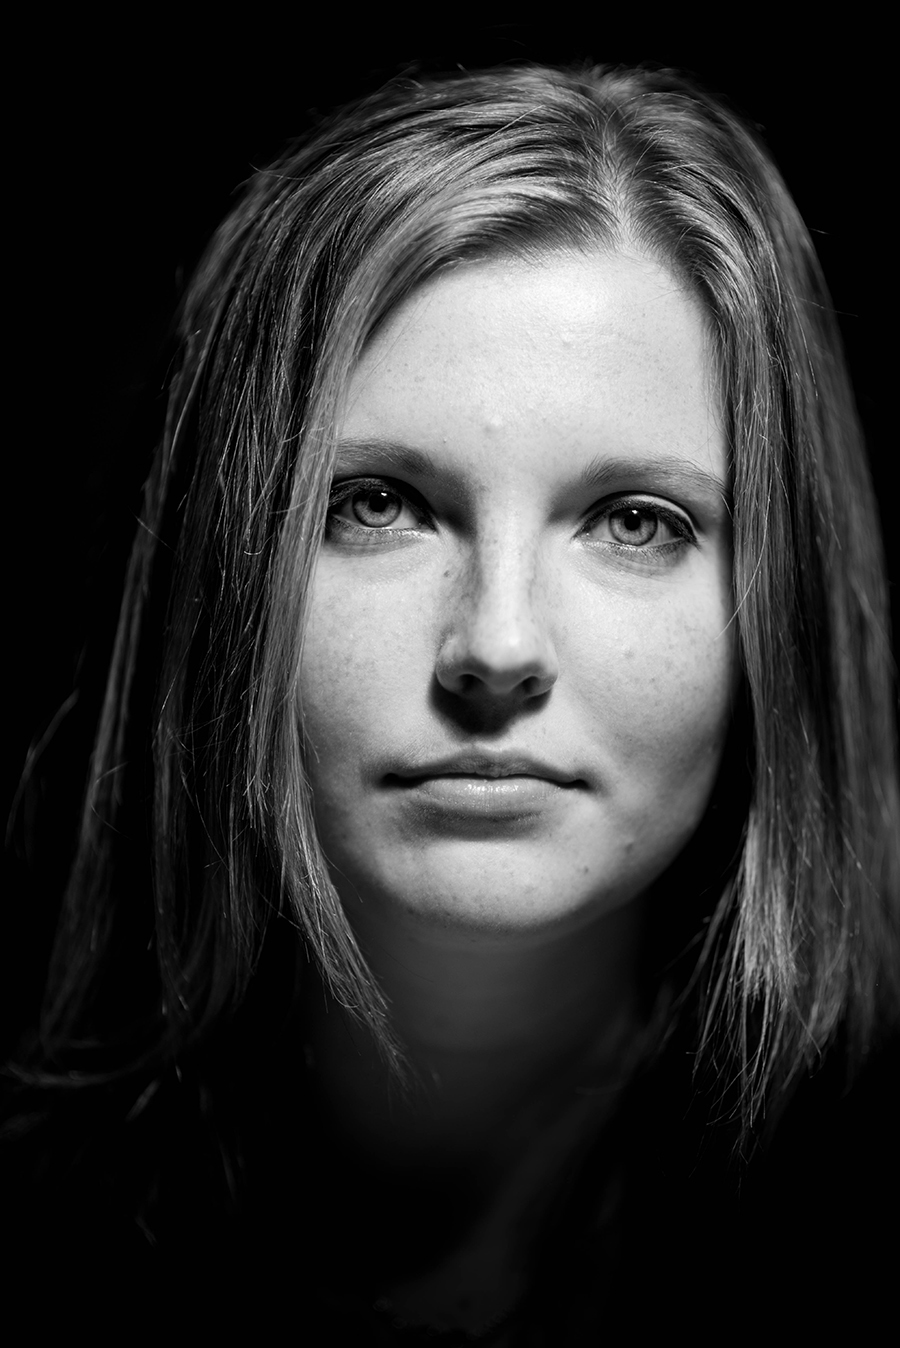 Hanna_A1_Sadness_photography_model_photo_emotion_portrait_headshot_kaleb_germinaro.jpg